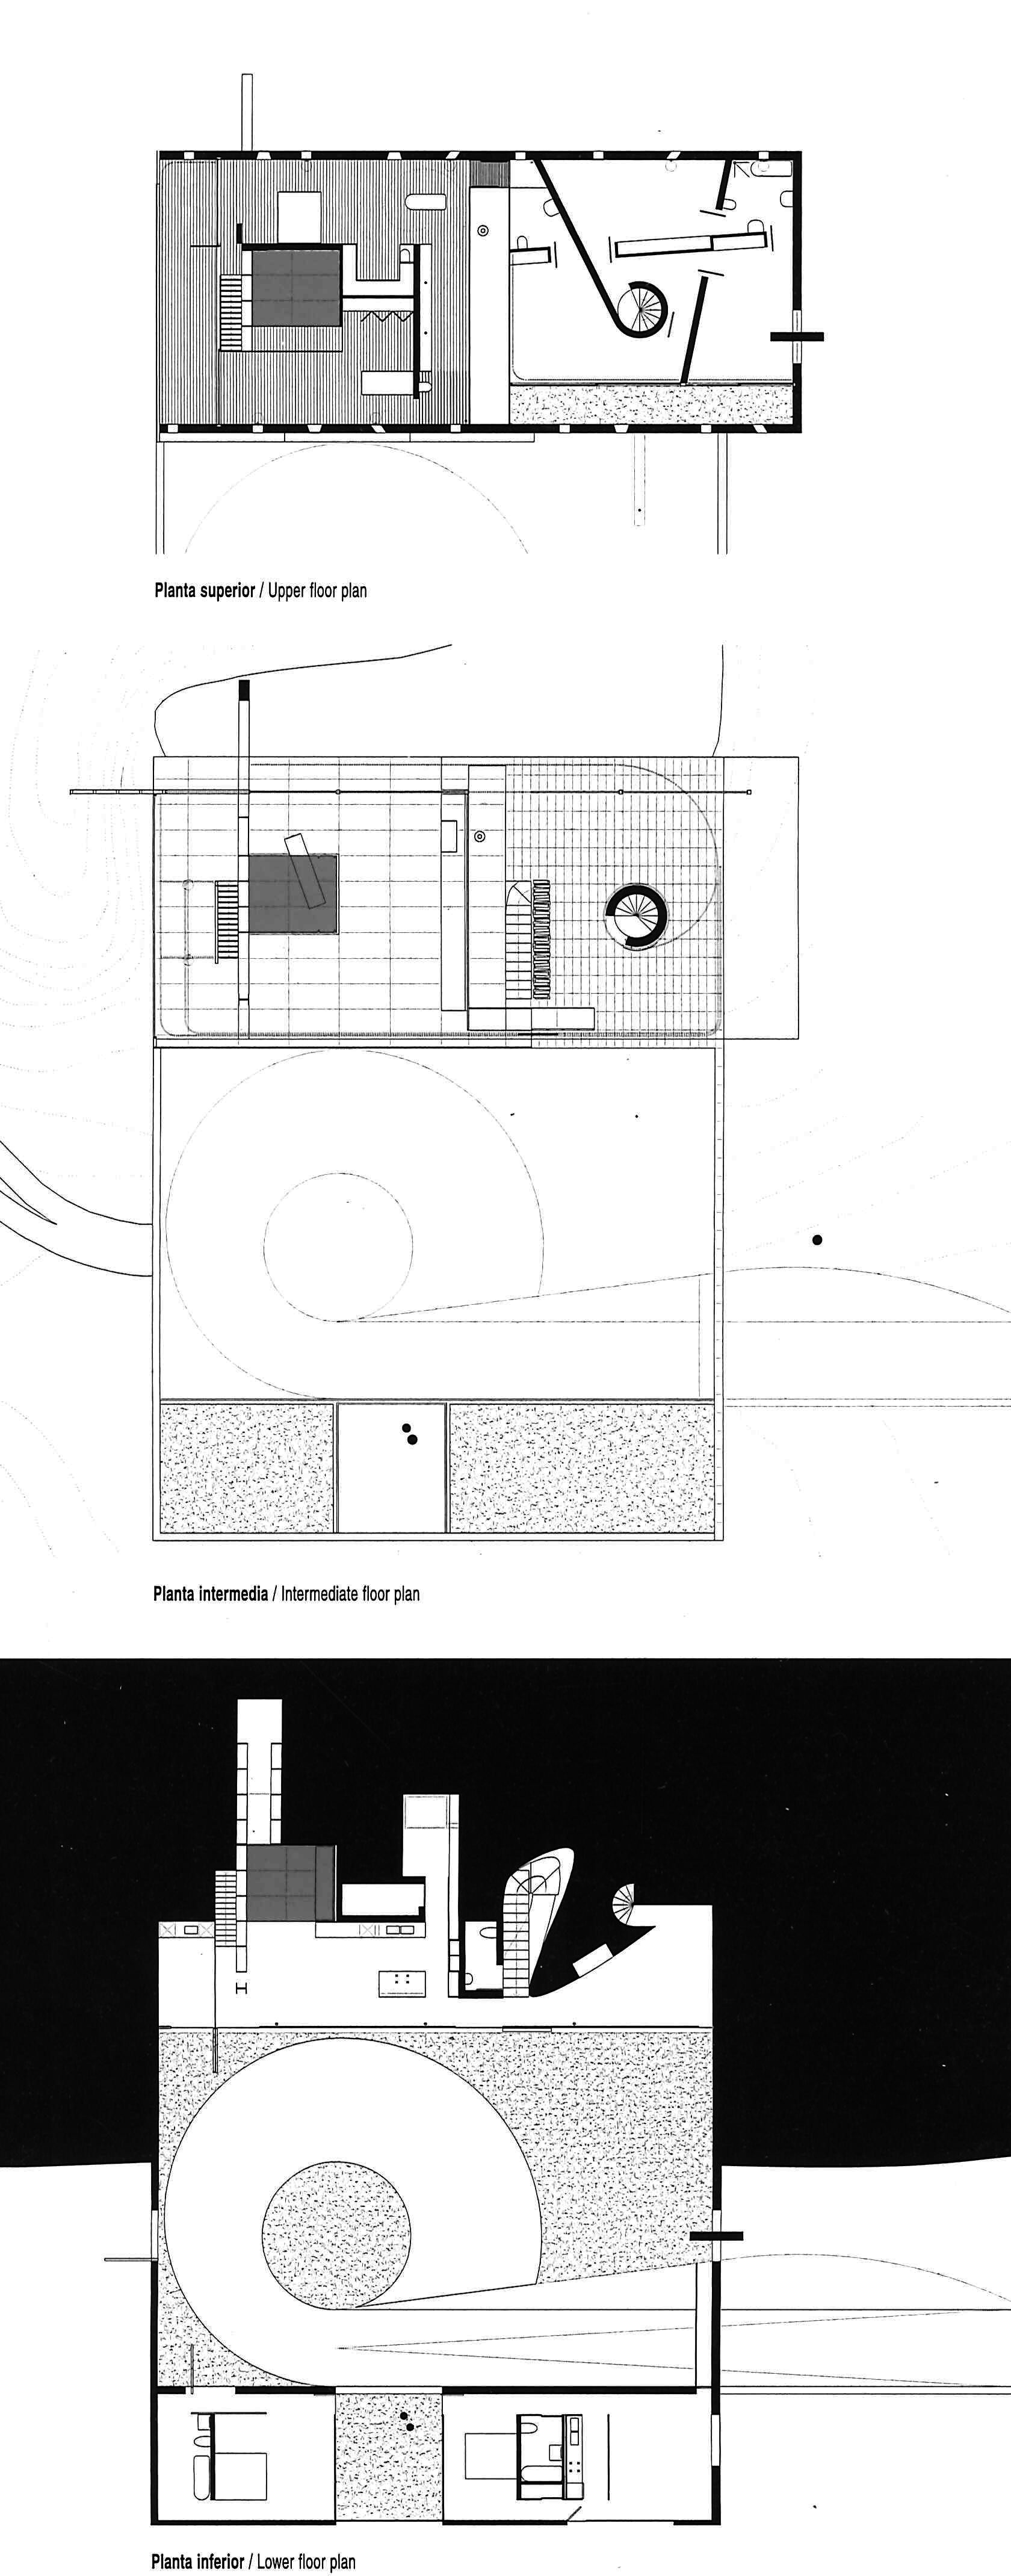 201209051236456140001g 16804280 planimetria pinterest famous architects solutioingenieria Image collections